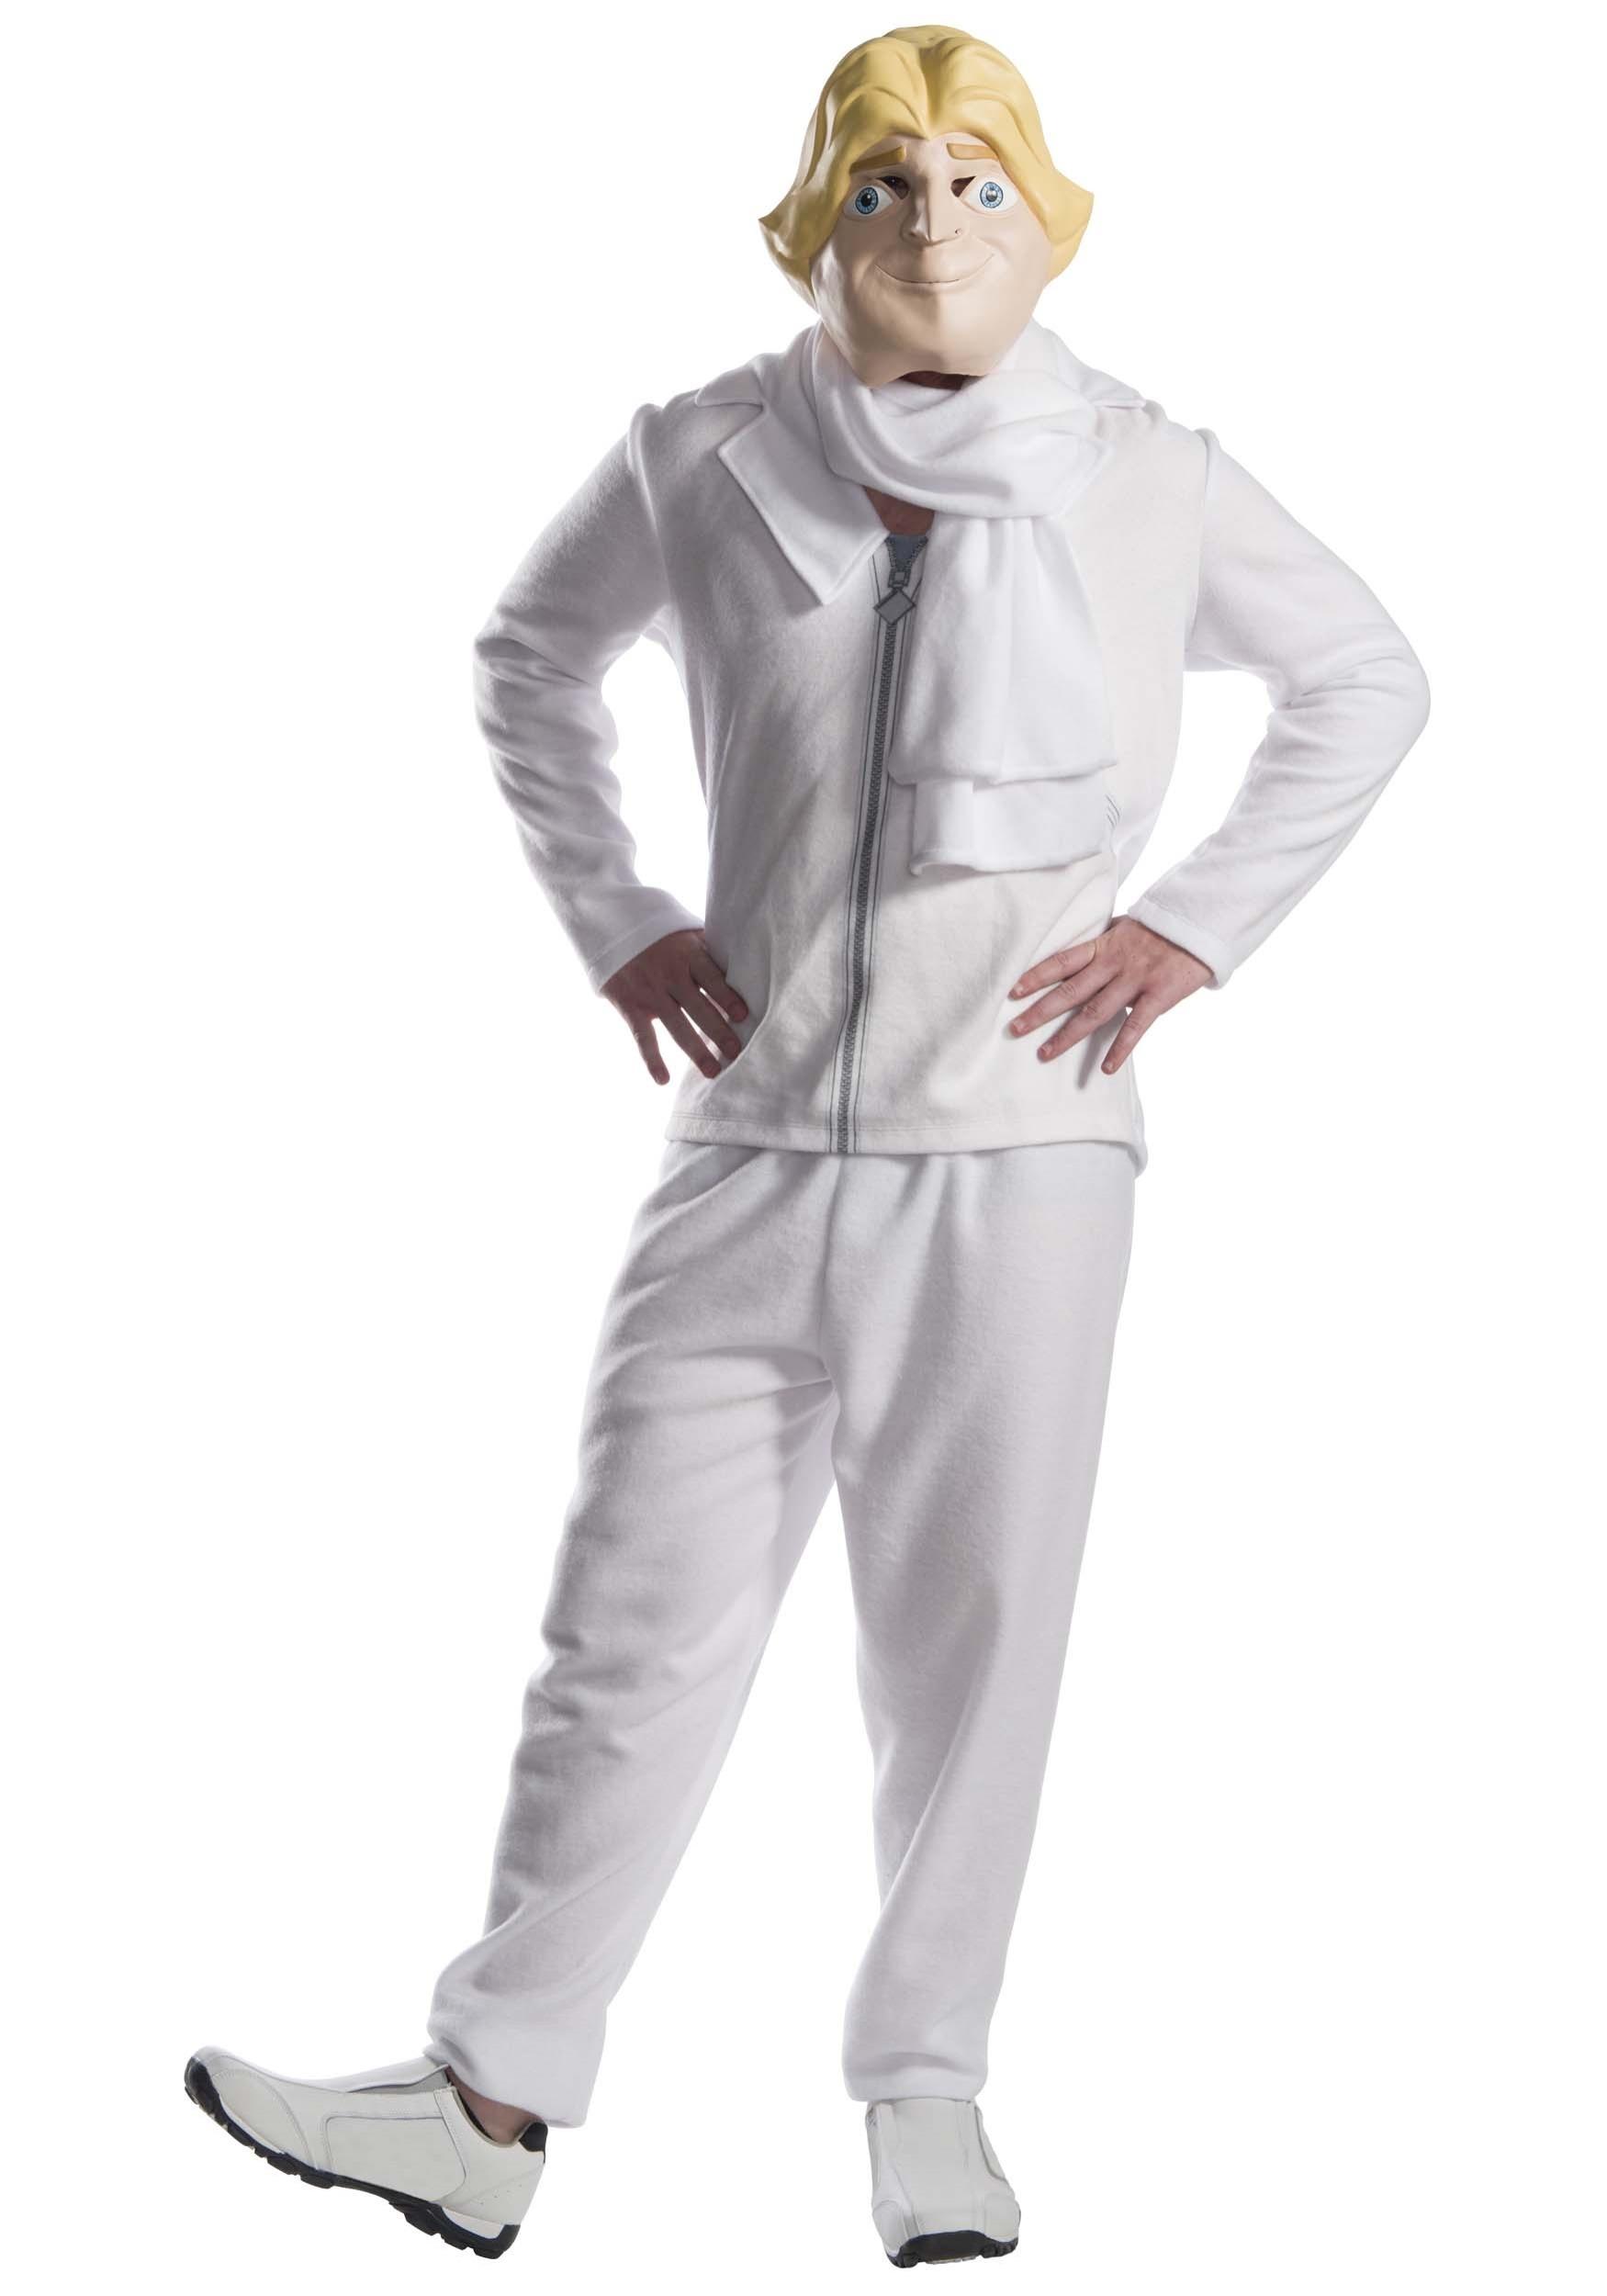 Costume Balthazar Boys 3 Despicable Me Bratt Christmas Nativity Villain NEW kids